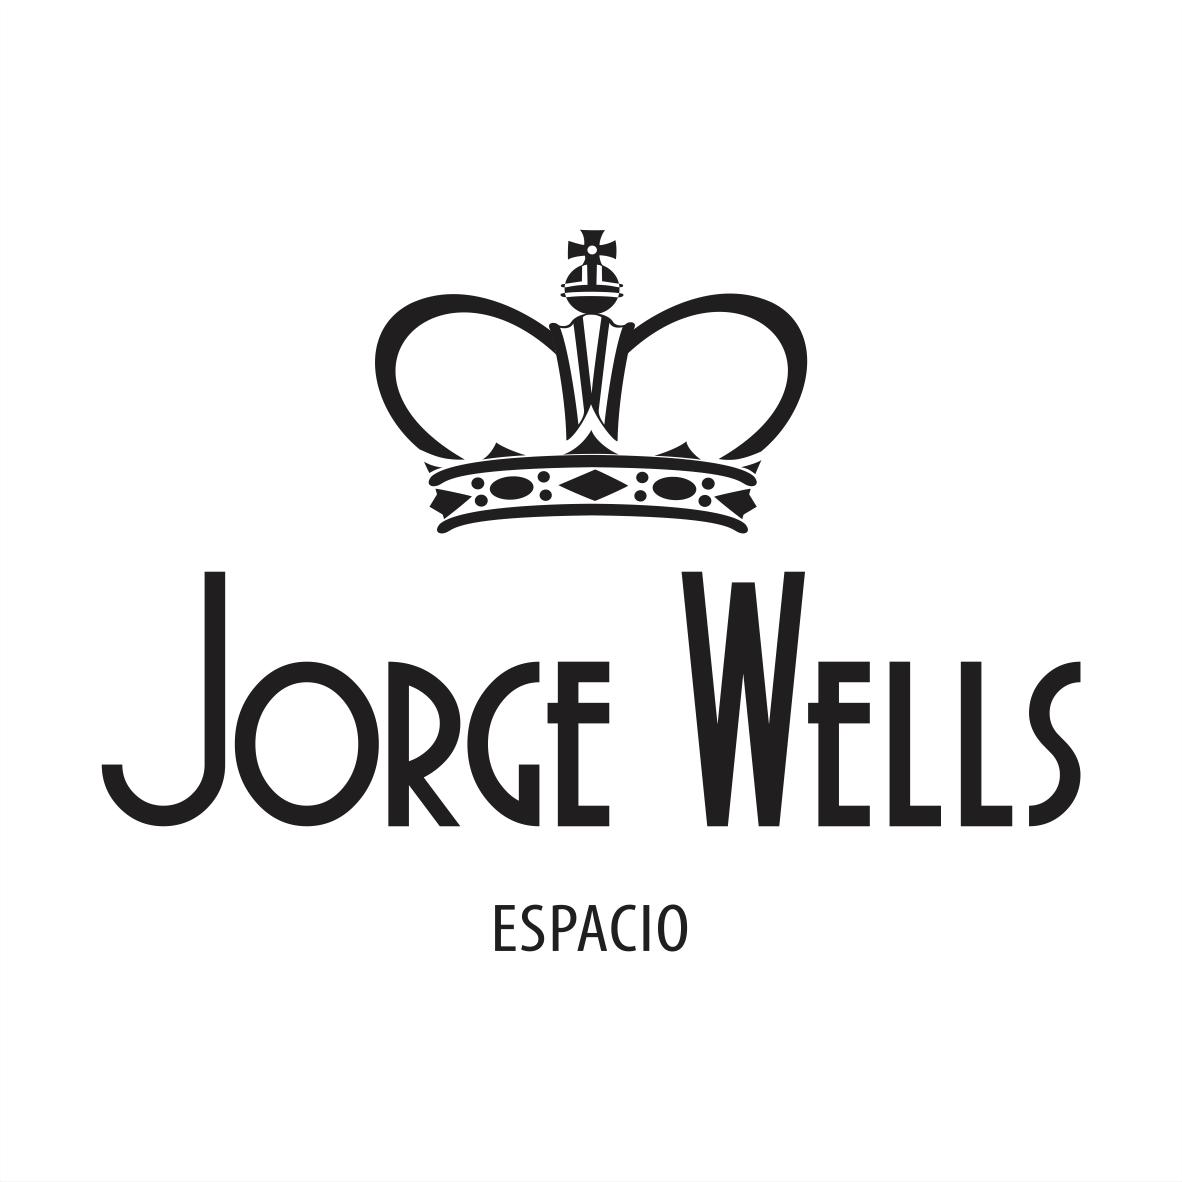 Jorge Wells